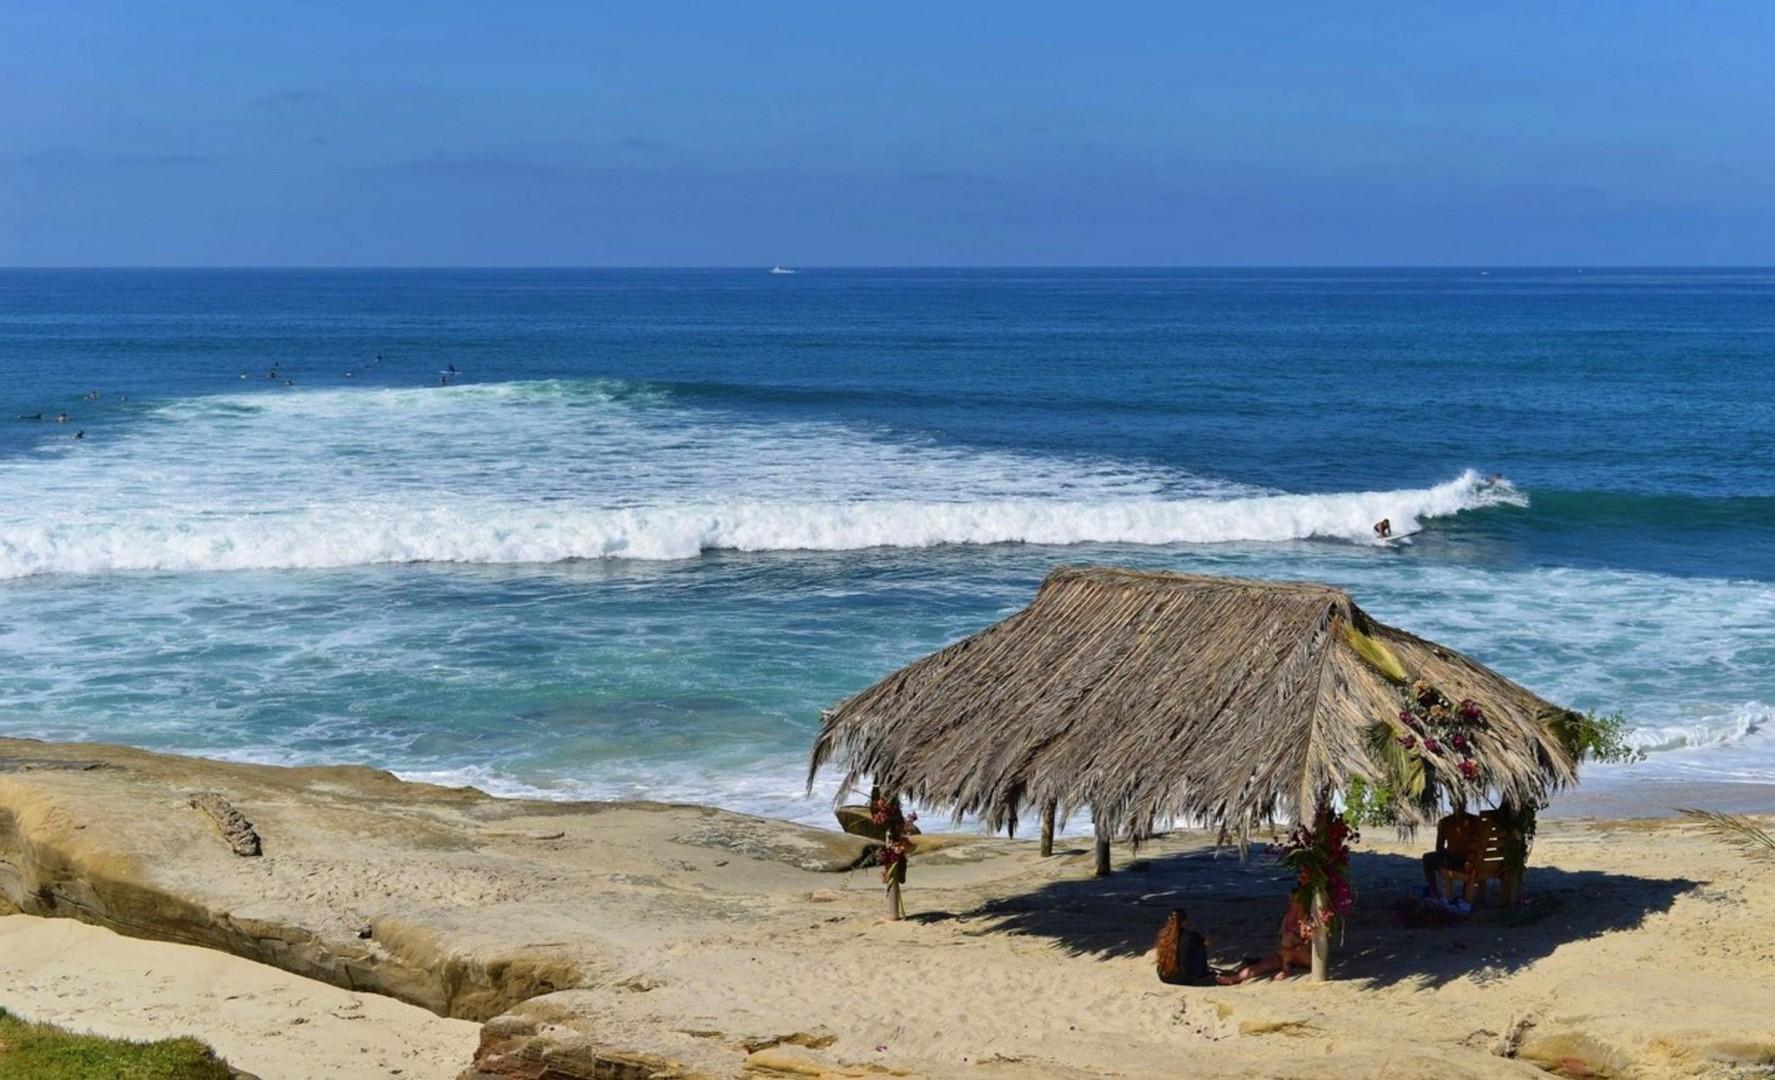 Surf break at Windansea Beach